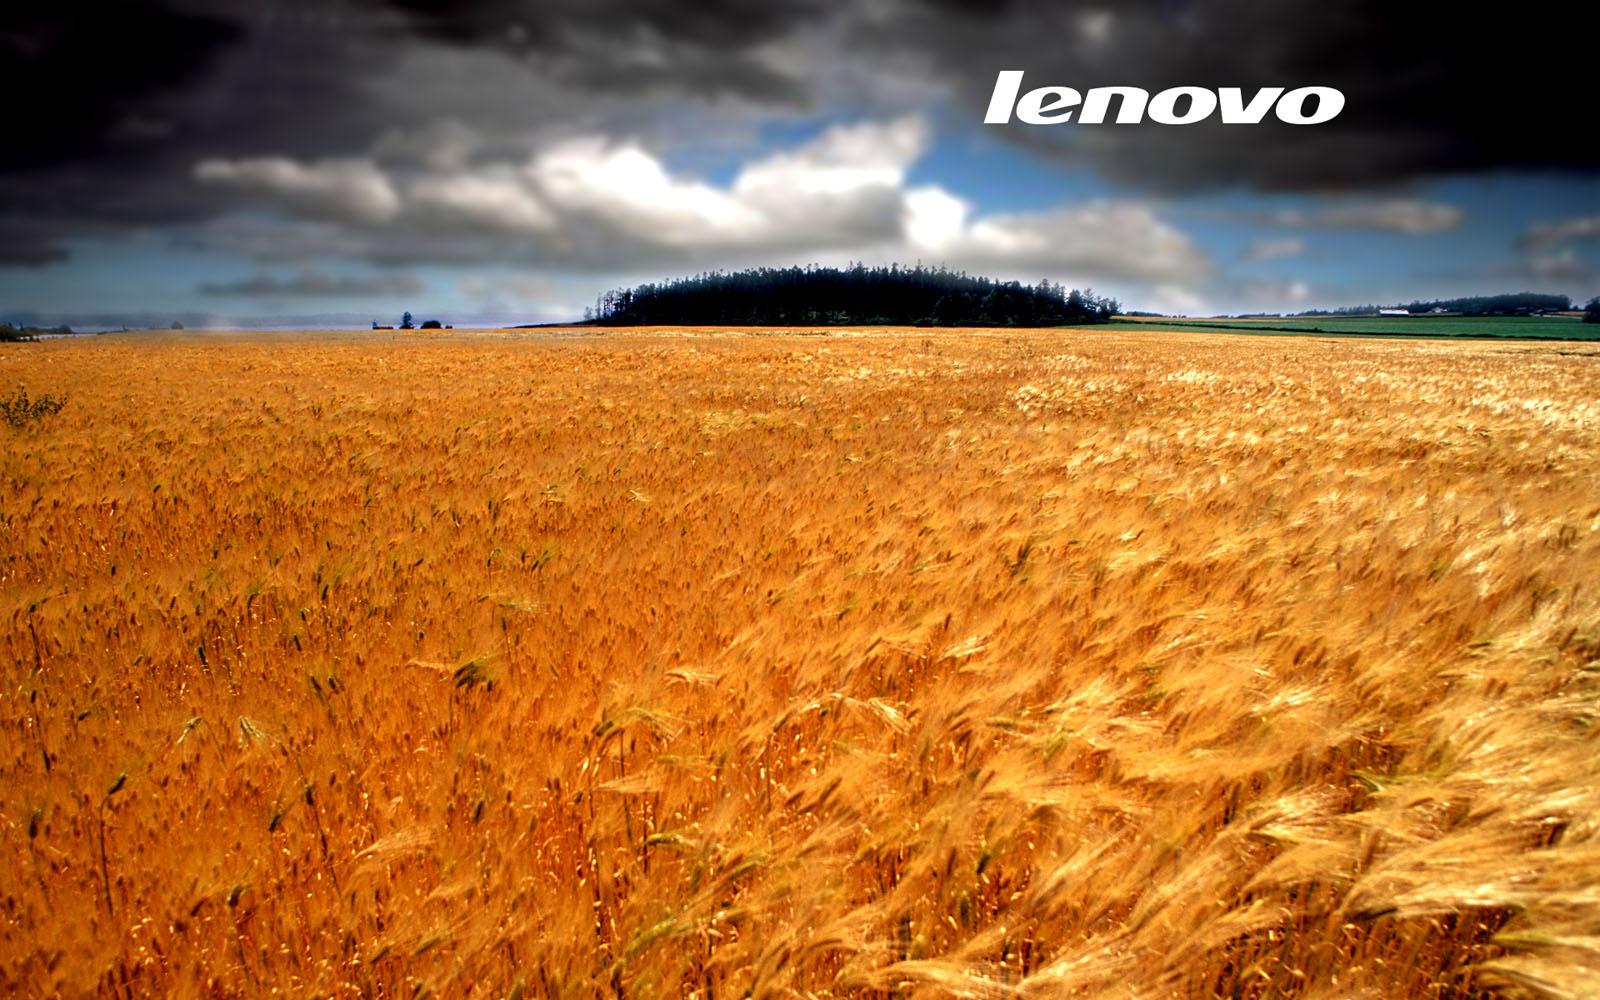 Hd wallpaper lenovo - Hd Wallpaper Lenovo 25